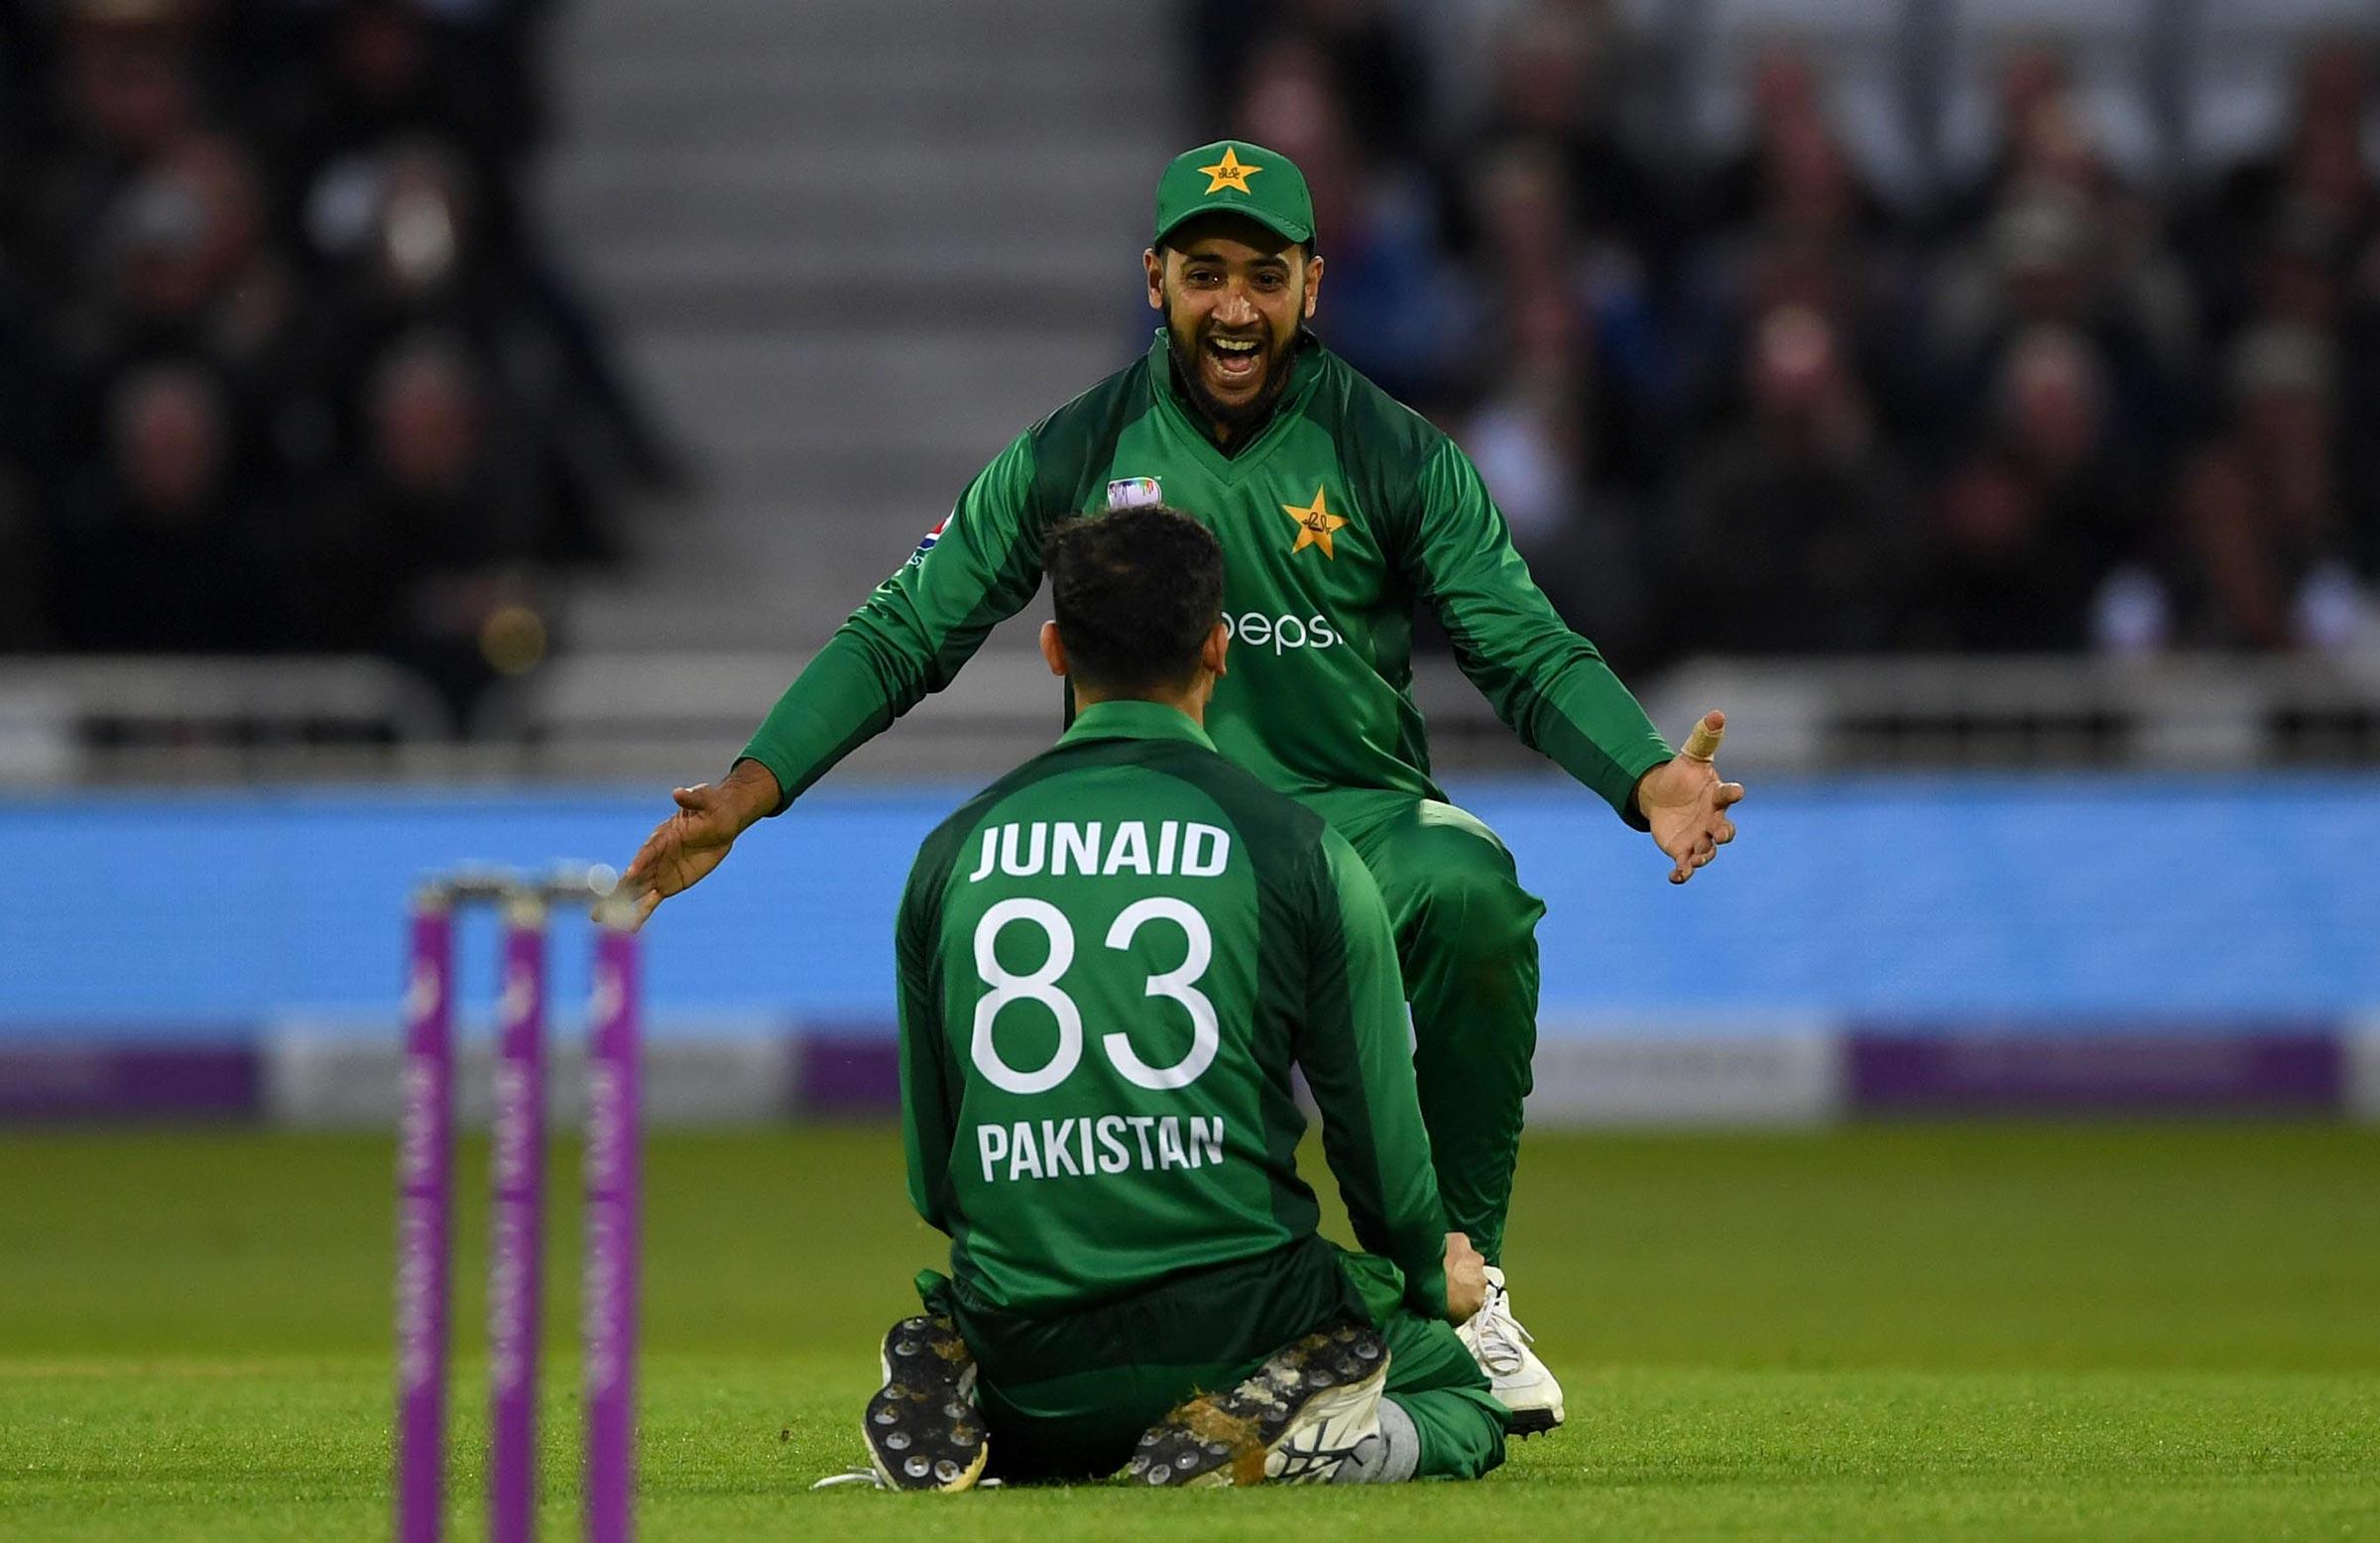 Junaid is swamped after dismissing Denly // Getty